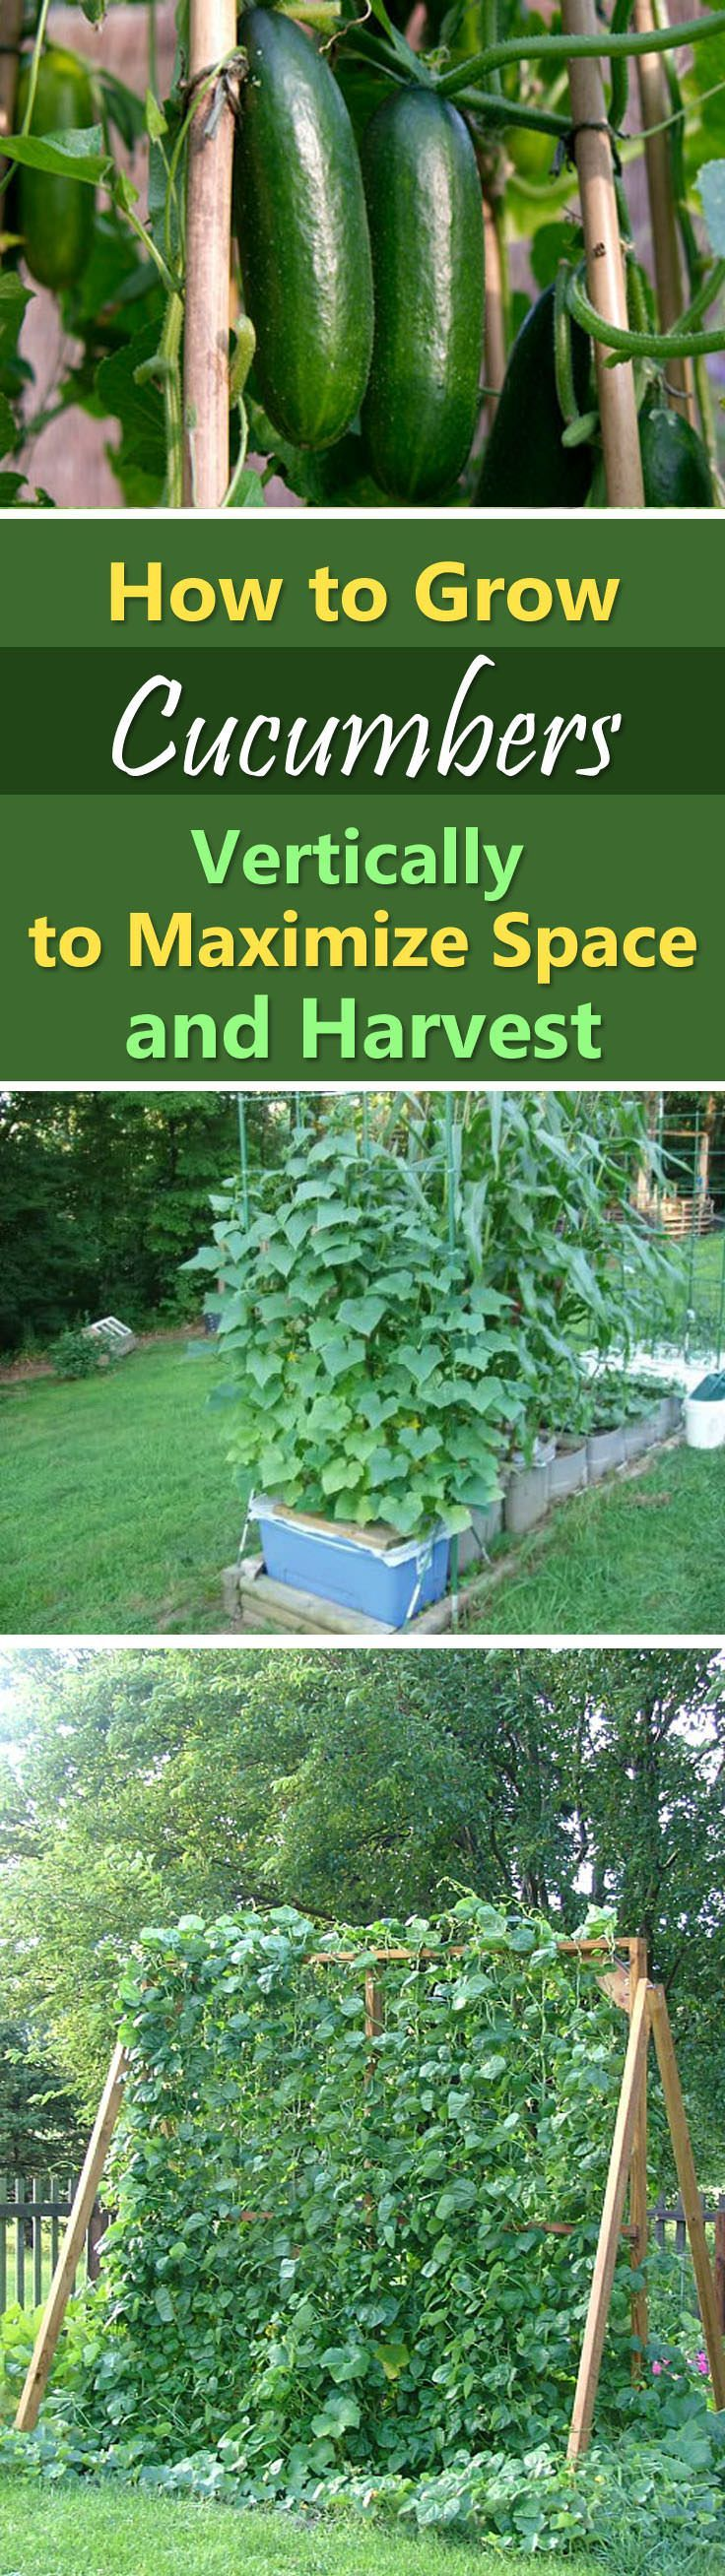 Small backyard veggie garden - Growing Cucumbers Vertically Garden Ideas